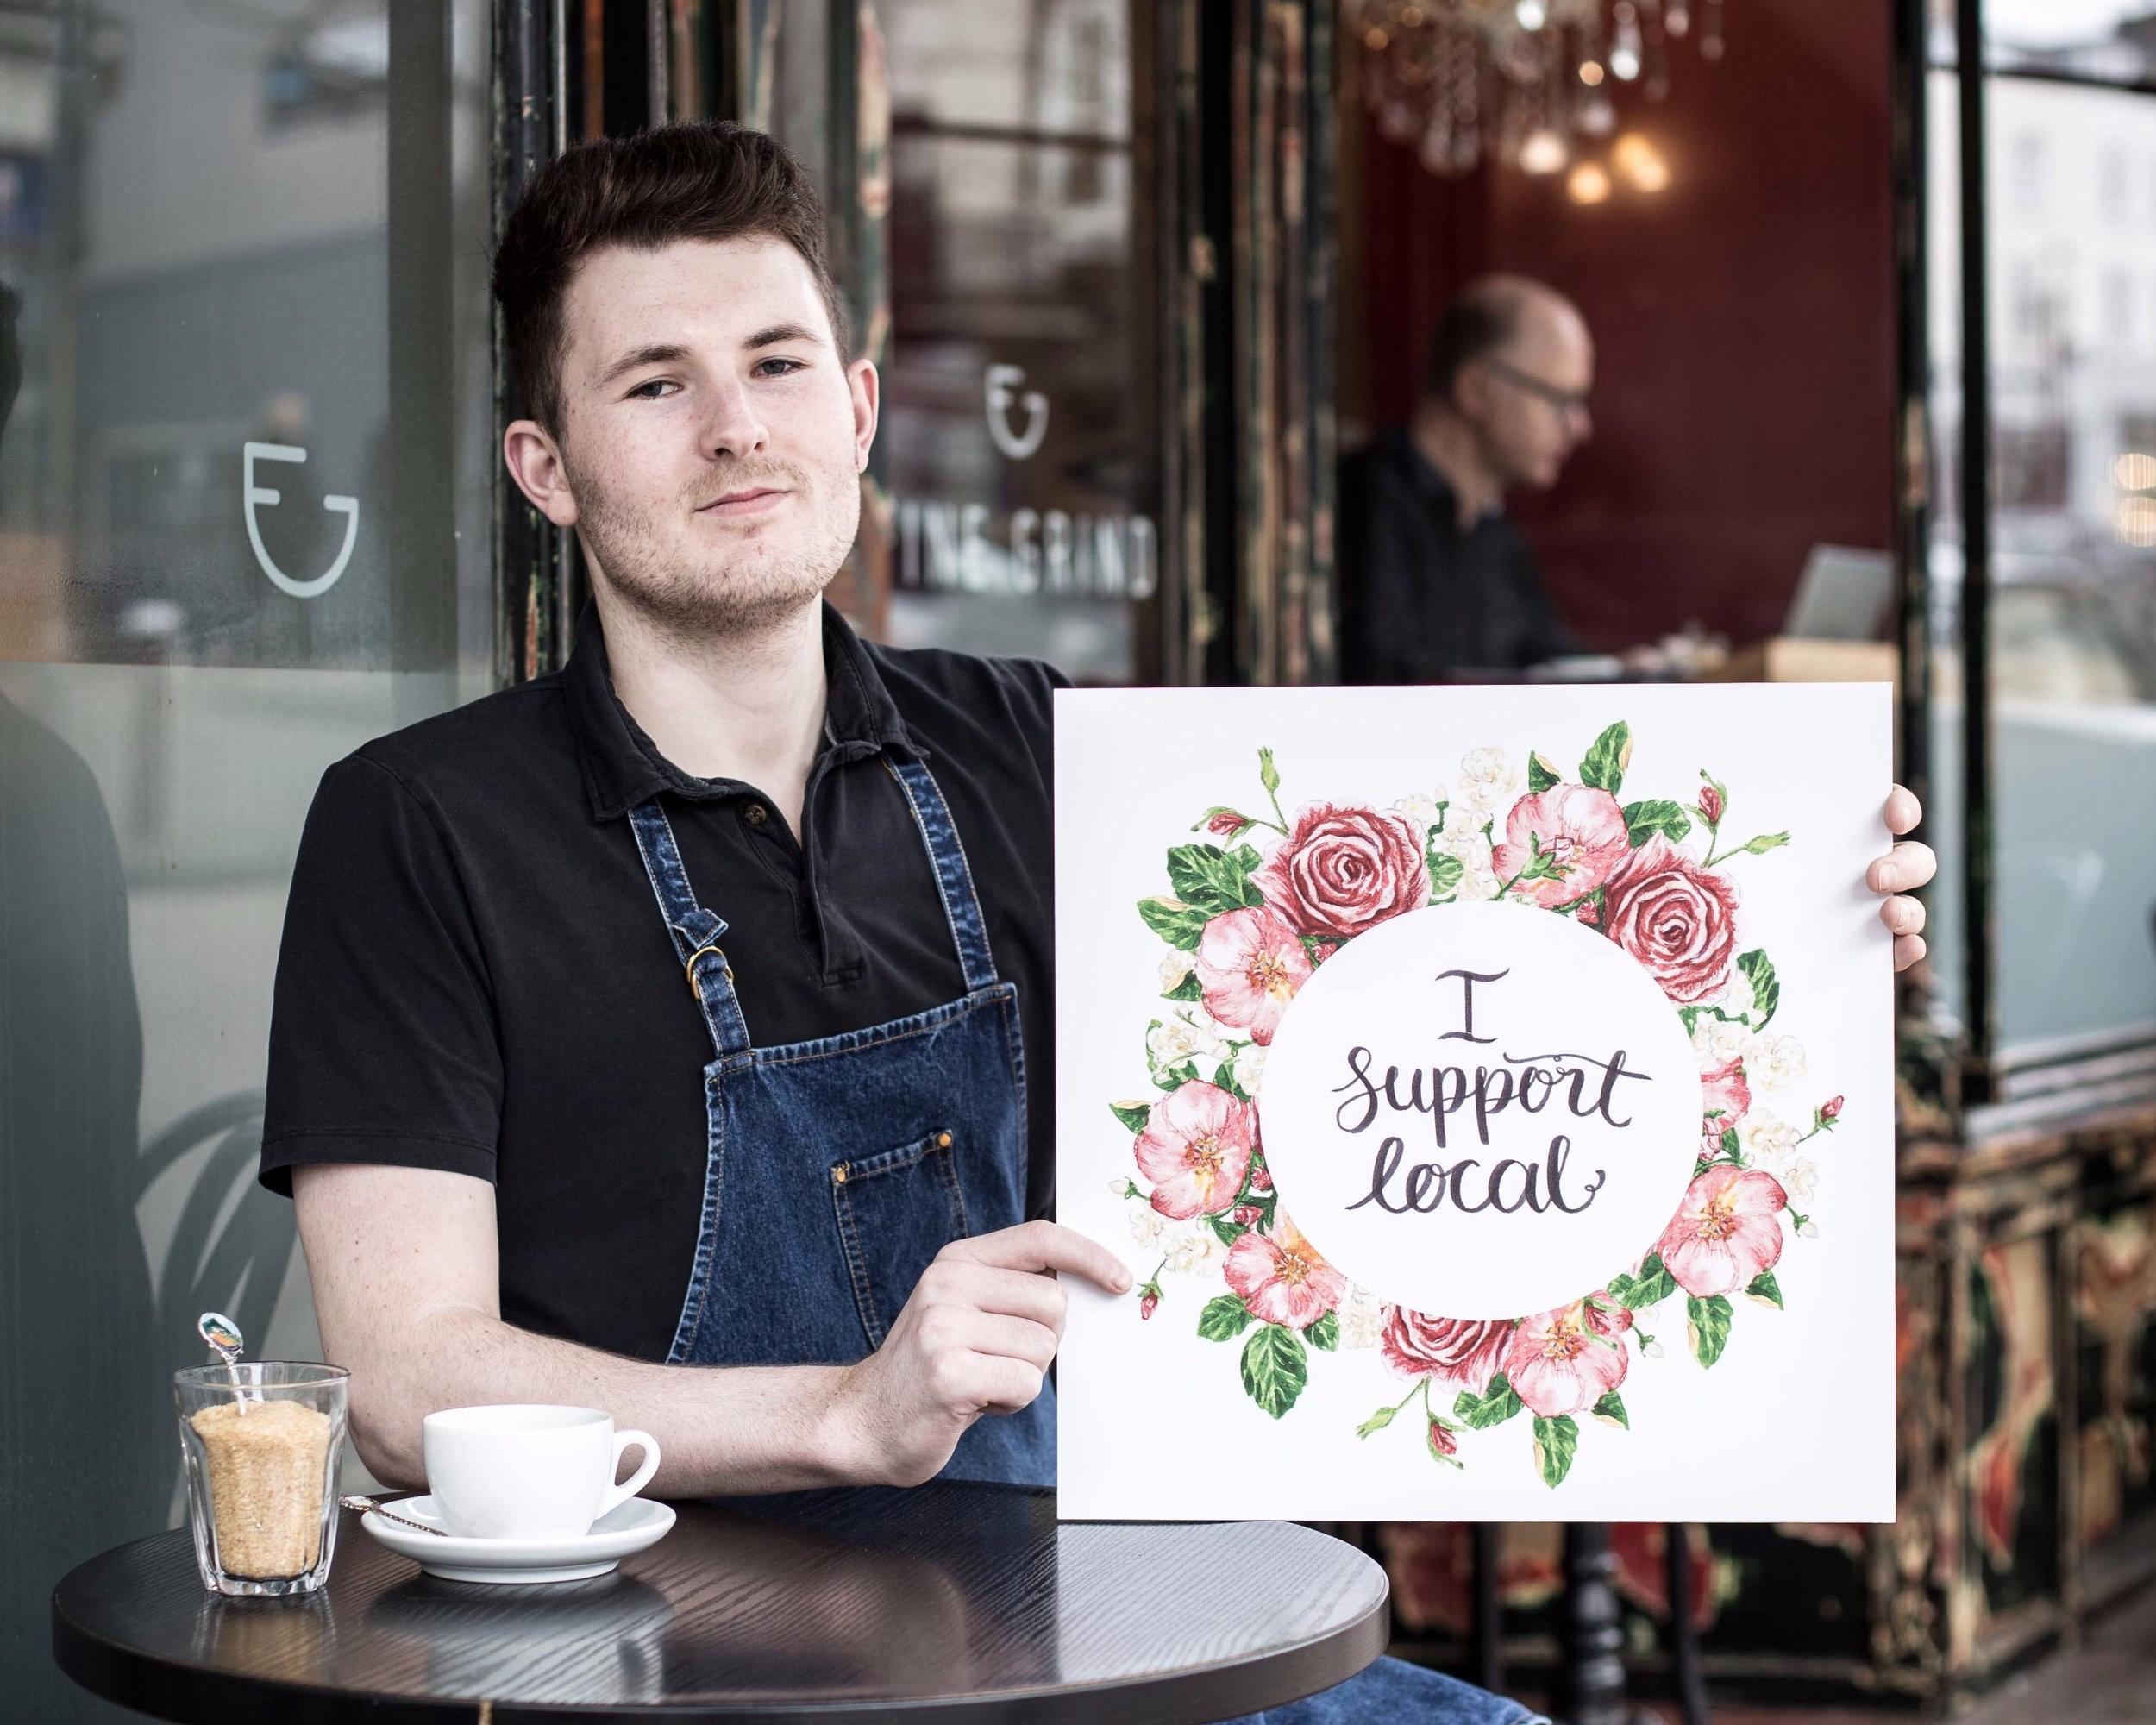 the-fine-grind-tunbridge-wells-coffee-shop-support-local-magazine-stockist.jpg